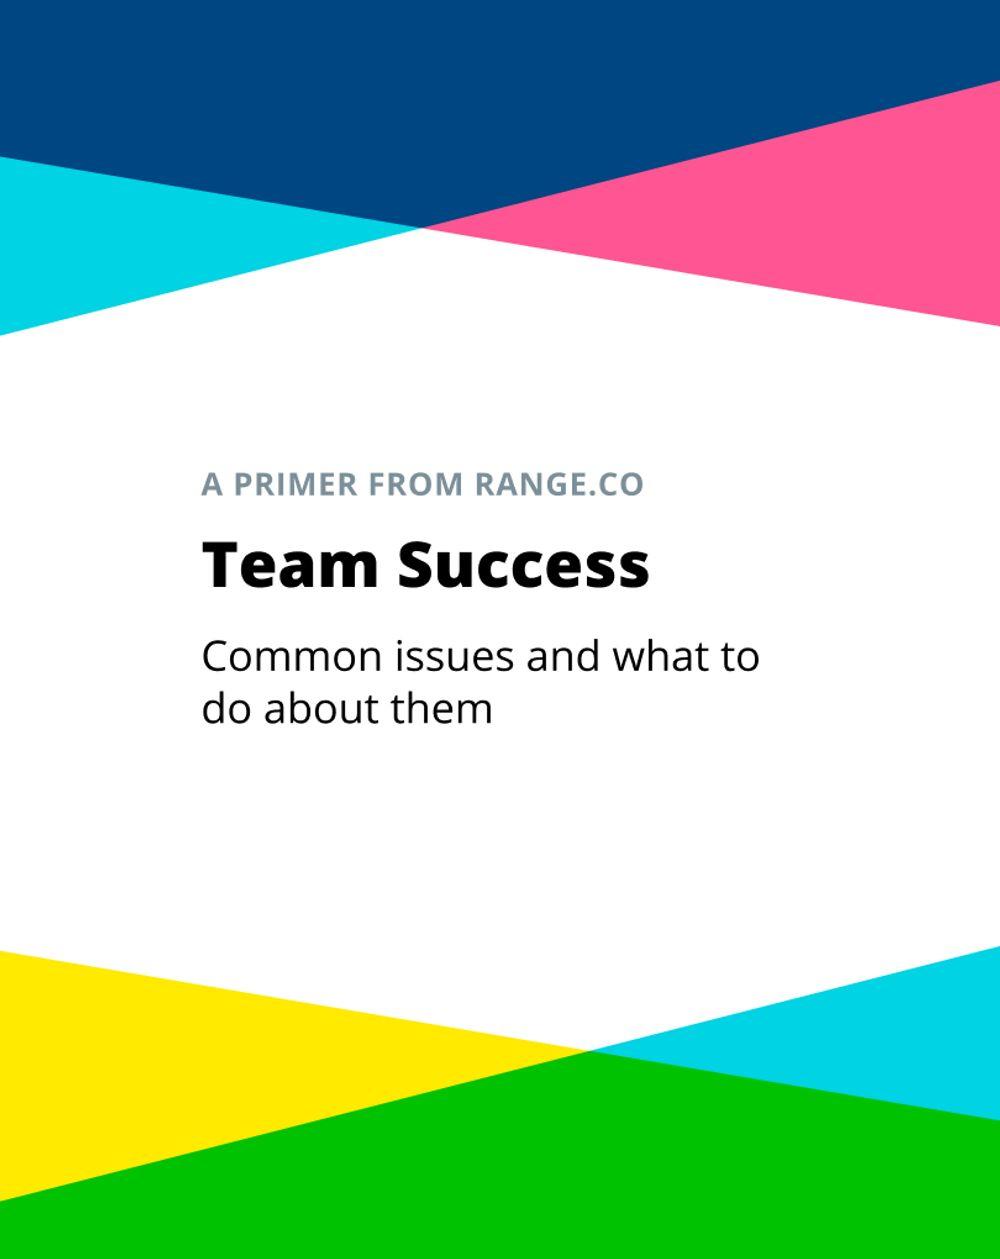 Download our primer team success